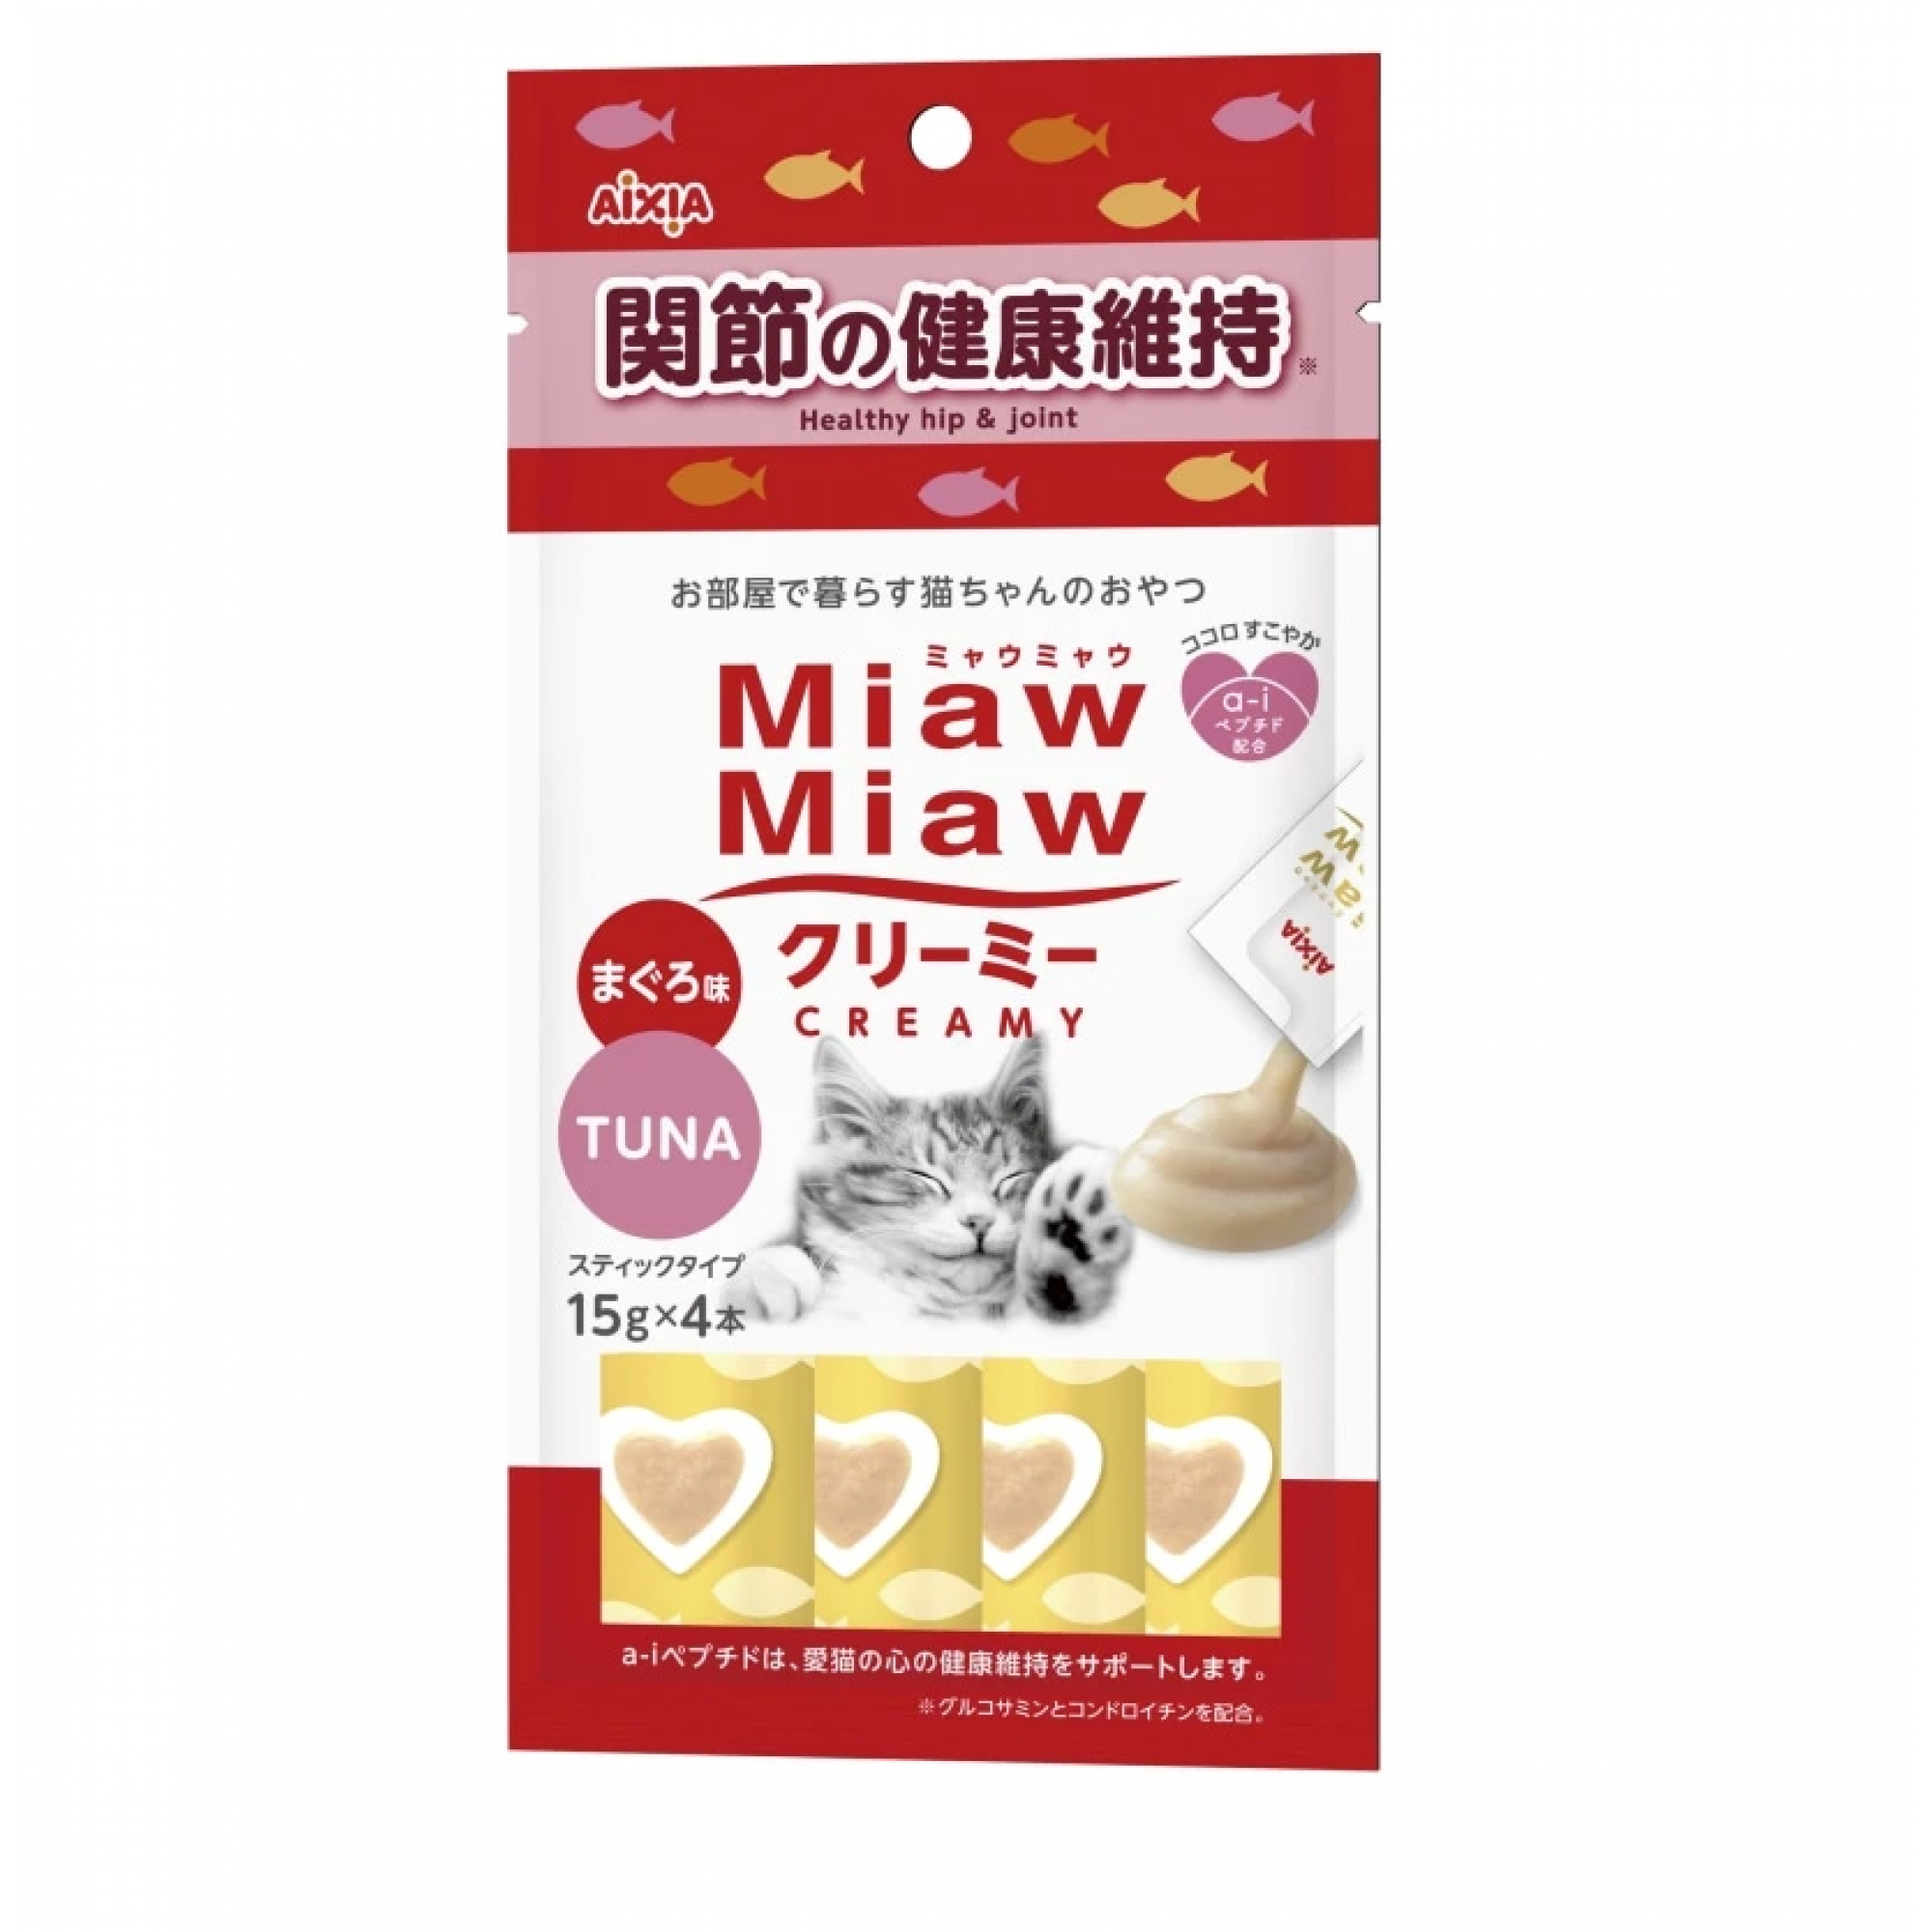 Aixia Miaw Miaw Creamy - Tuna Healthy Hip & Joint 15g x 4pcs